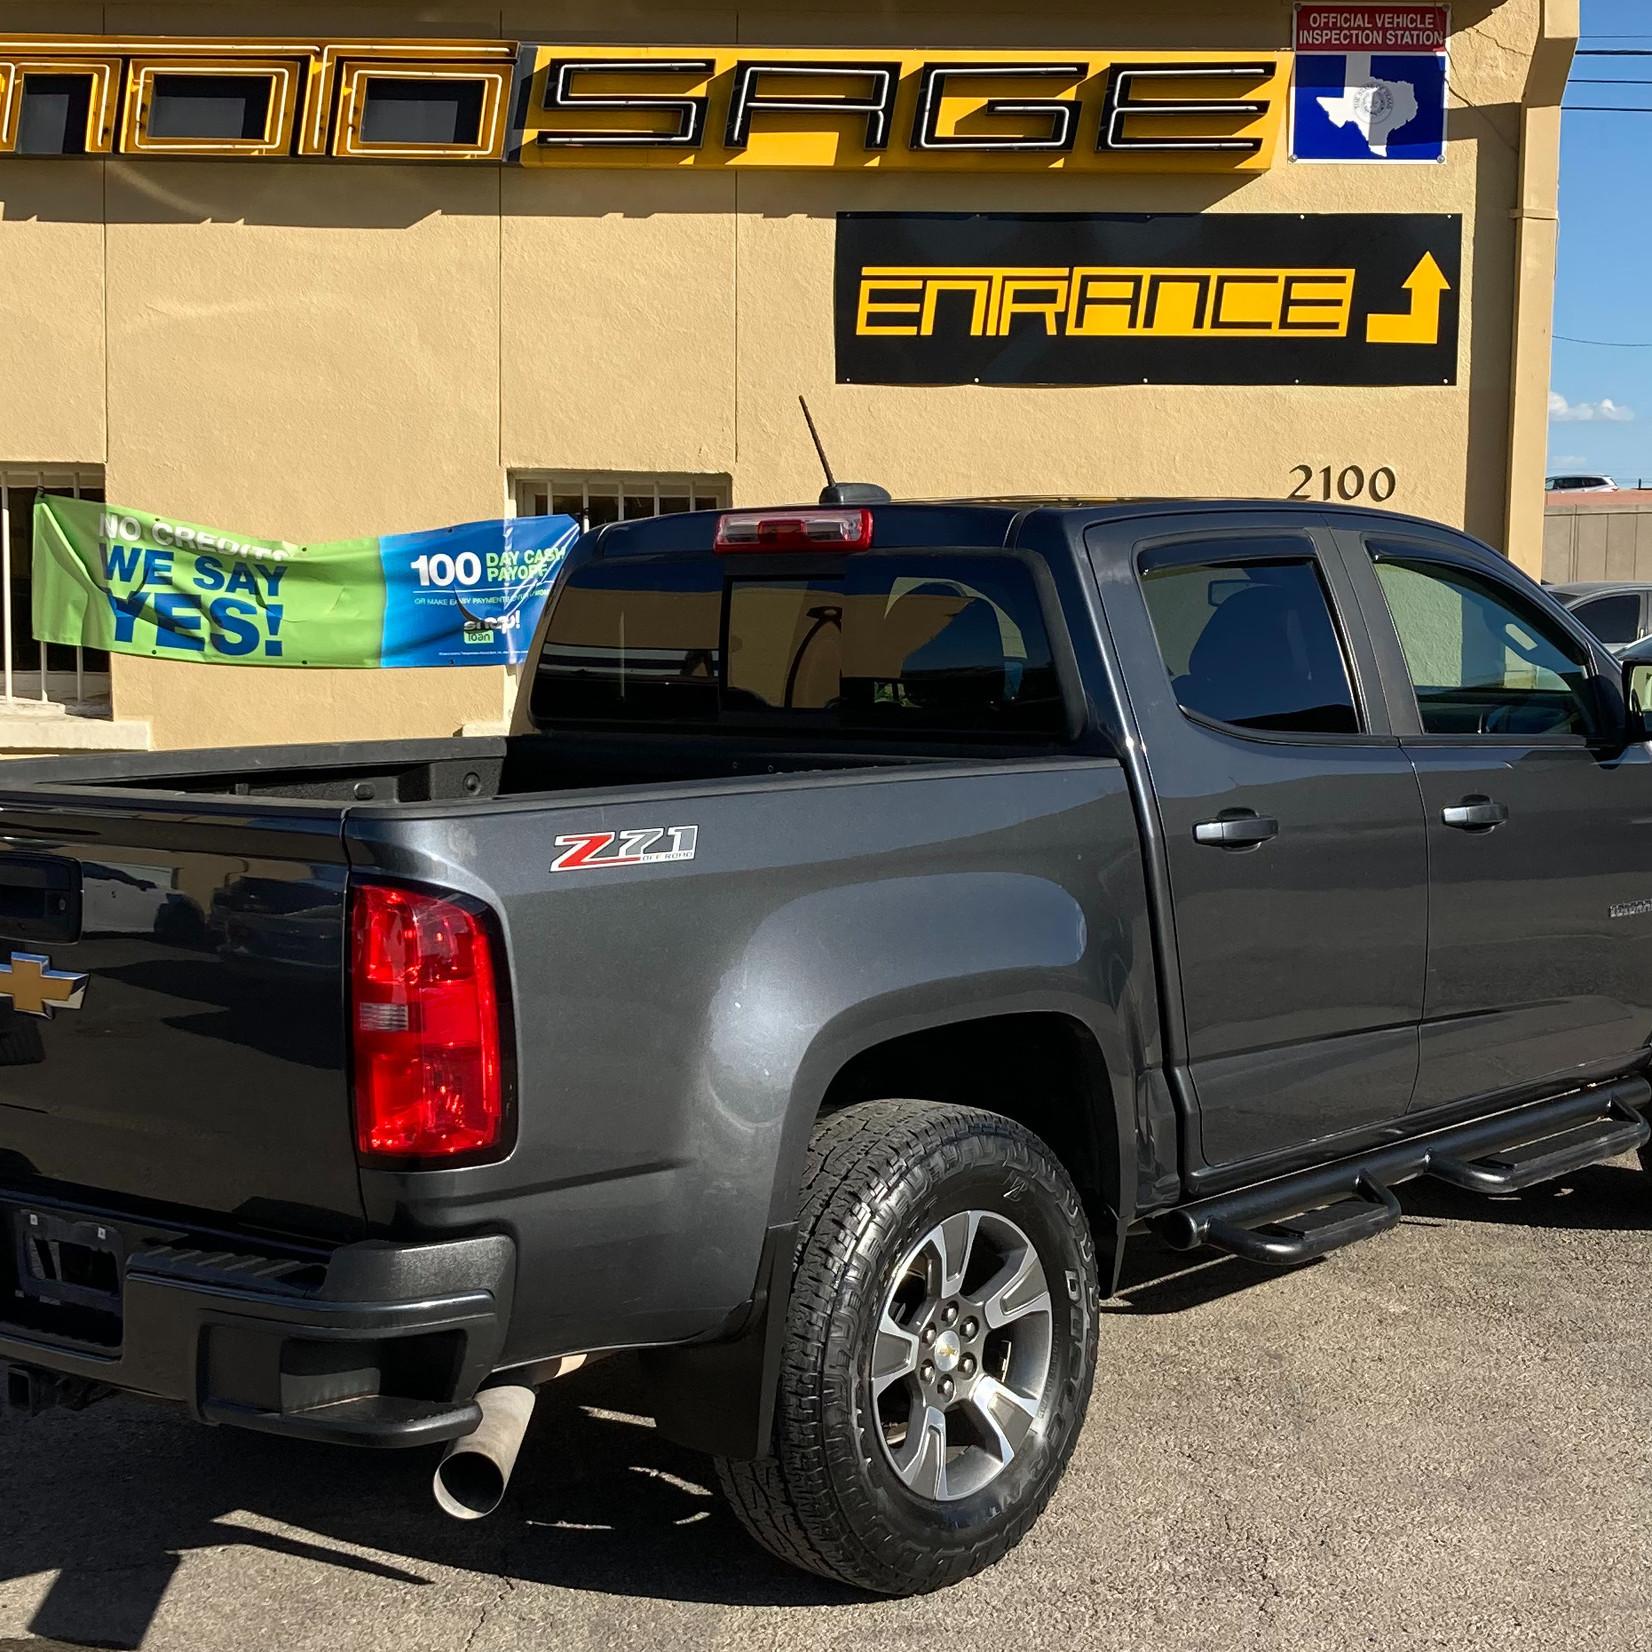 2016 Chevrolet Colorado Z71 4x4 Duramax 2.8l Turbodiesel  for Sale